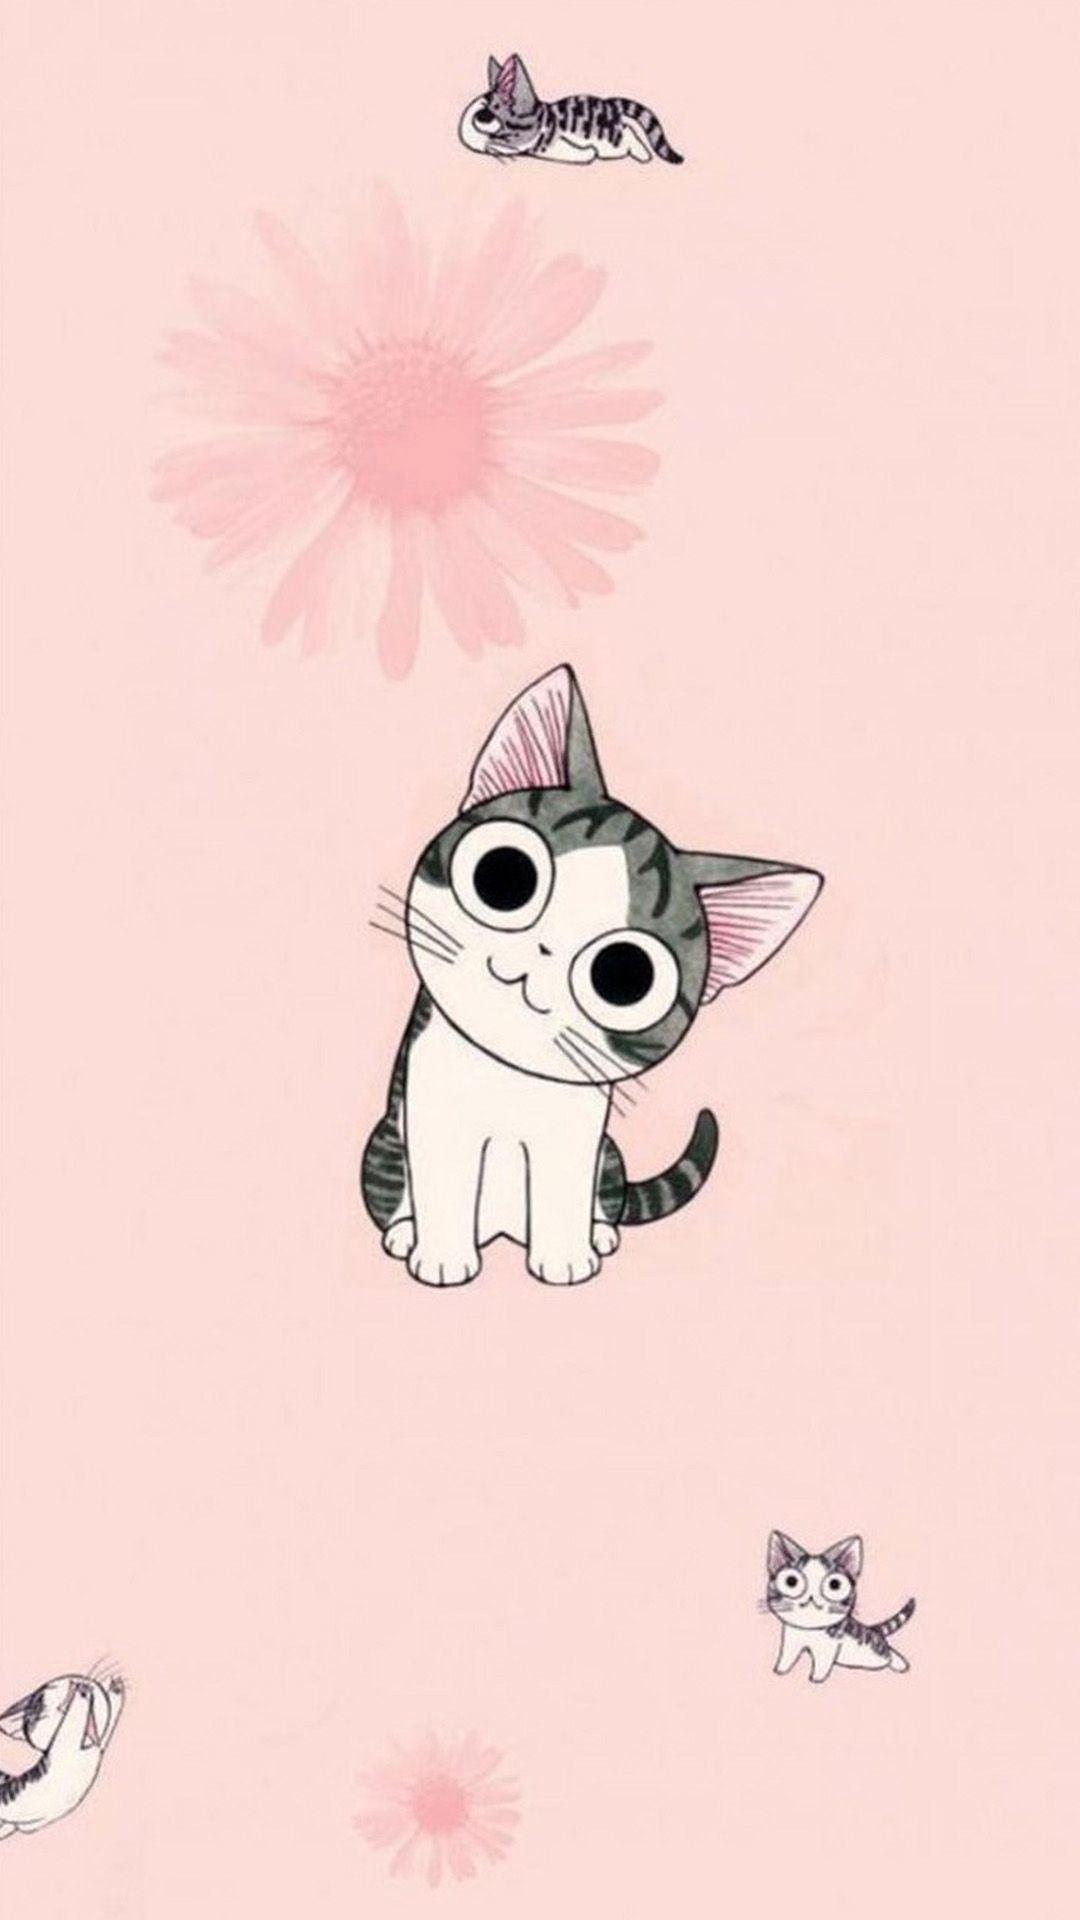 Cute Cartoon Dog Wallpapers Top Free Cute Cartoon Dog Backgrounds Wallpaperaccess